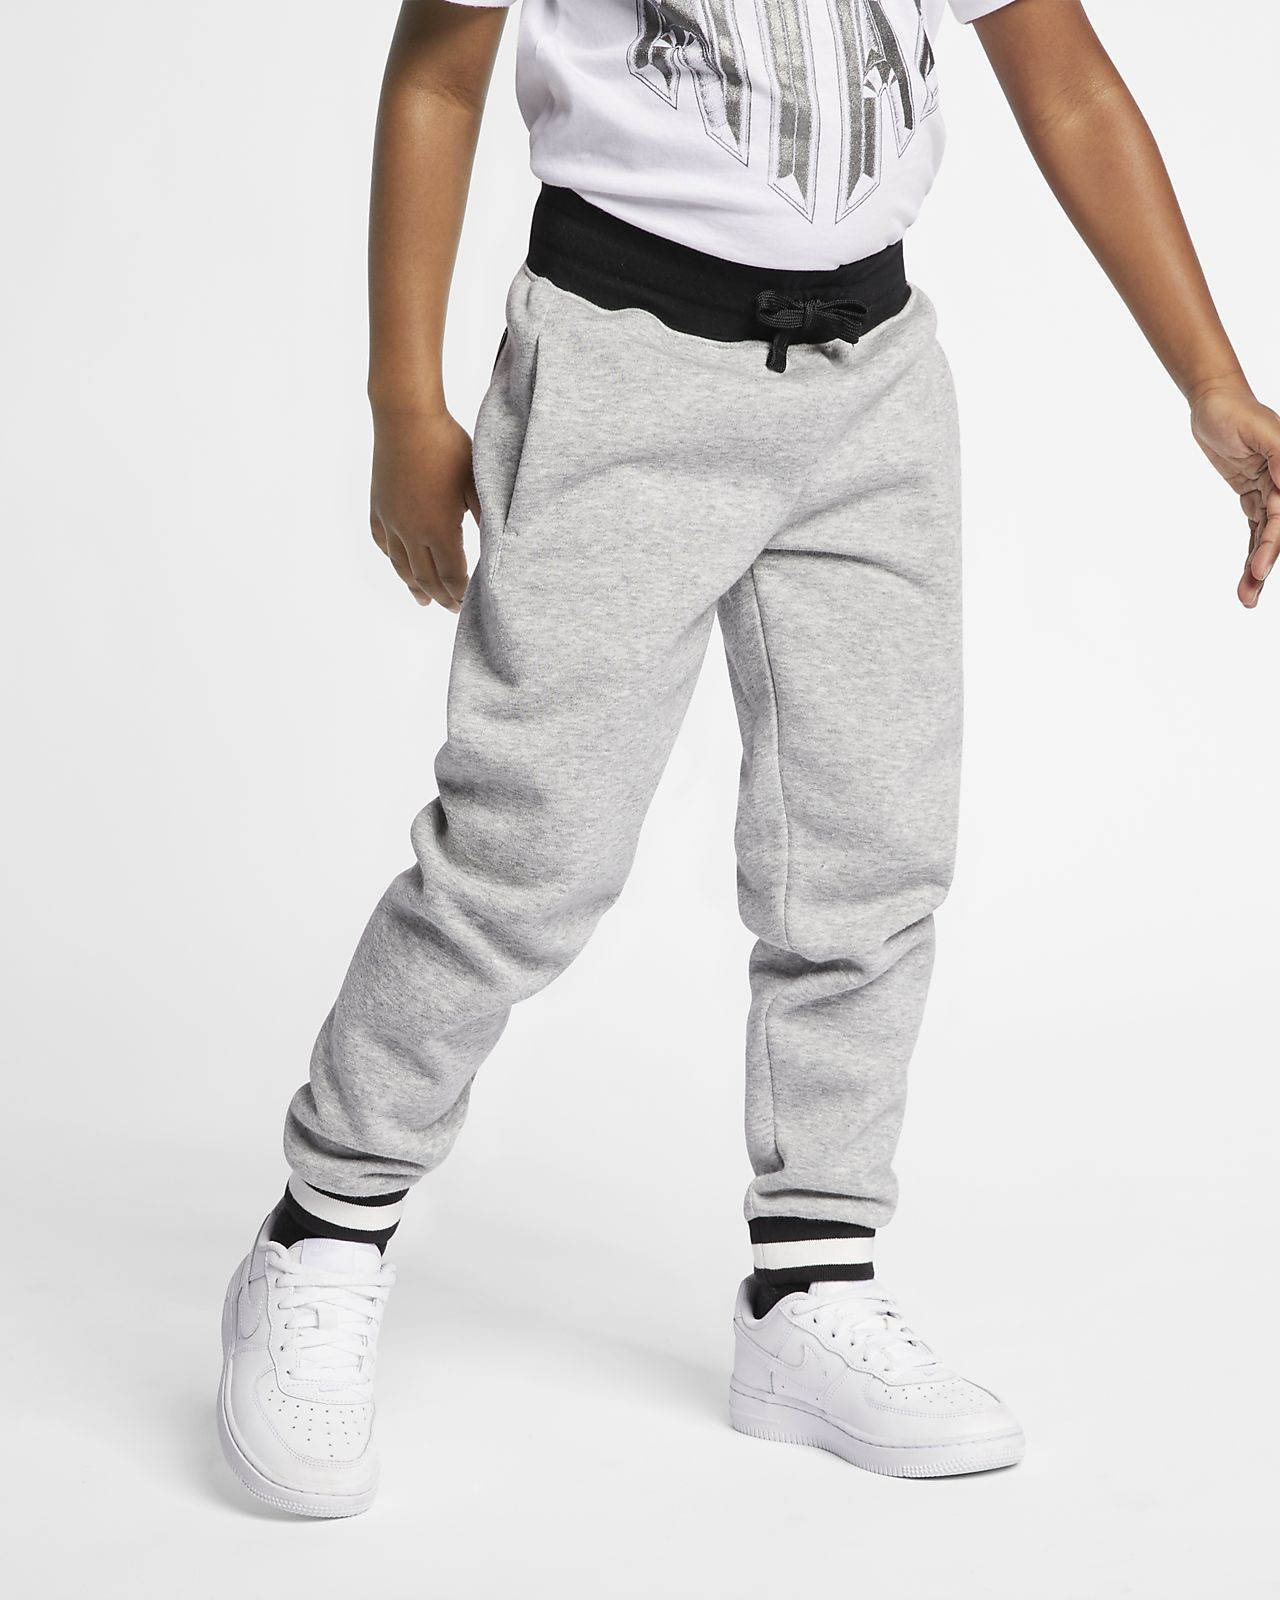 Nike Air Little Kids' Fleece Pants